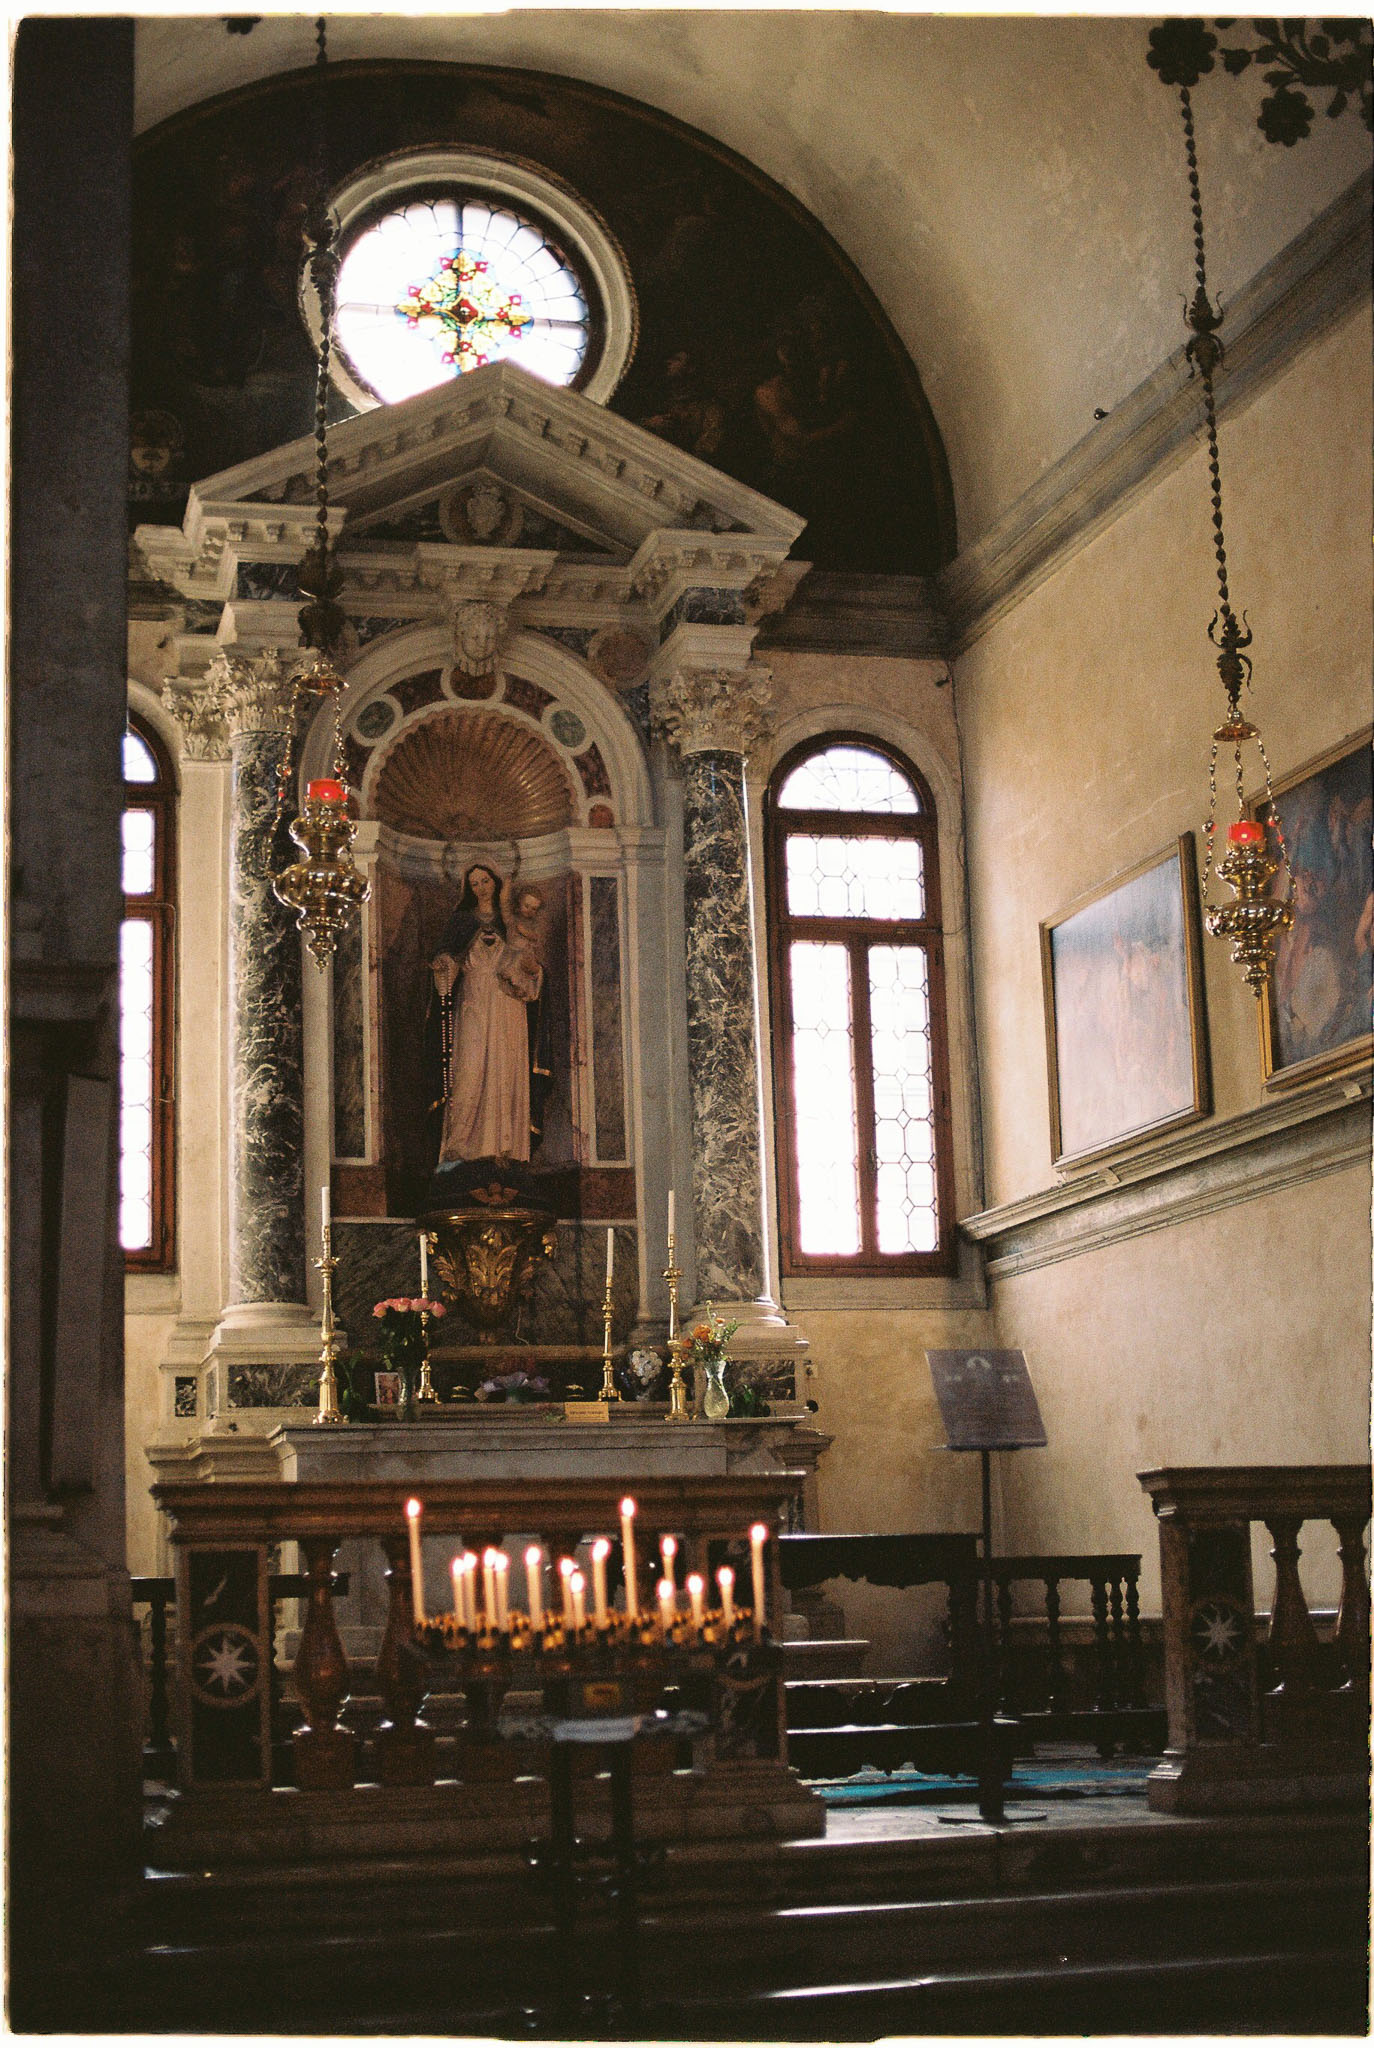 Venice cathedral kodak portra 160 nikon FE2 nikon 50mm 1.4D